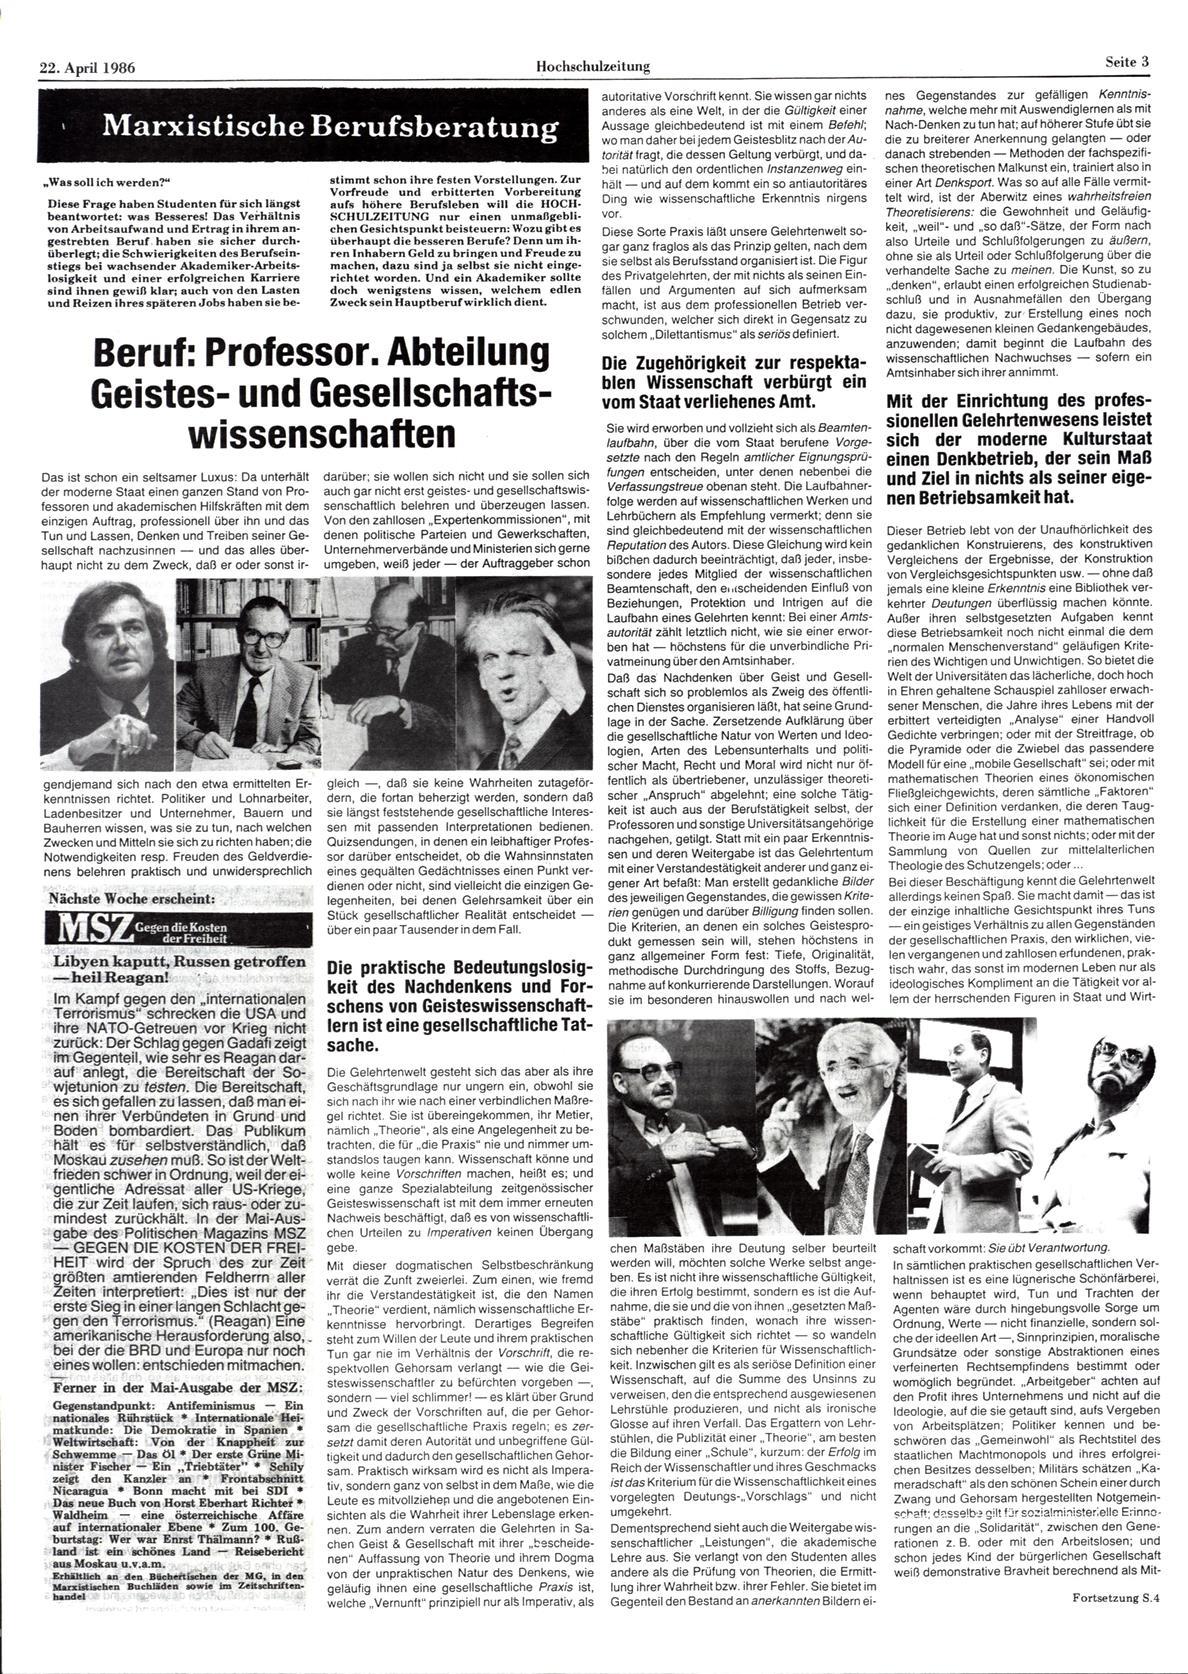 Bochum_BHZ_19860422_126_003